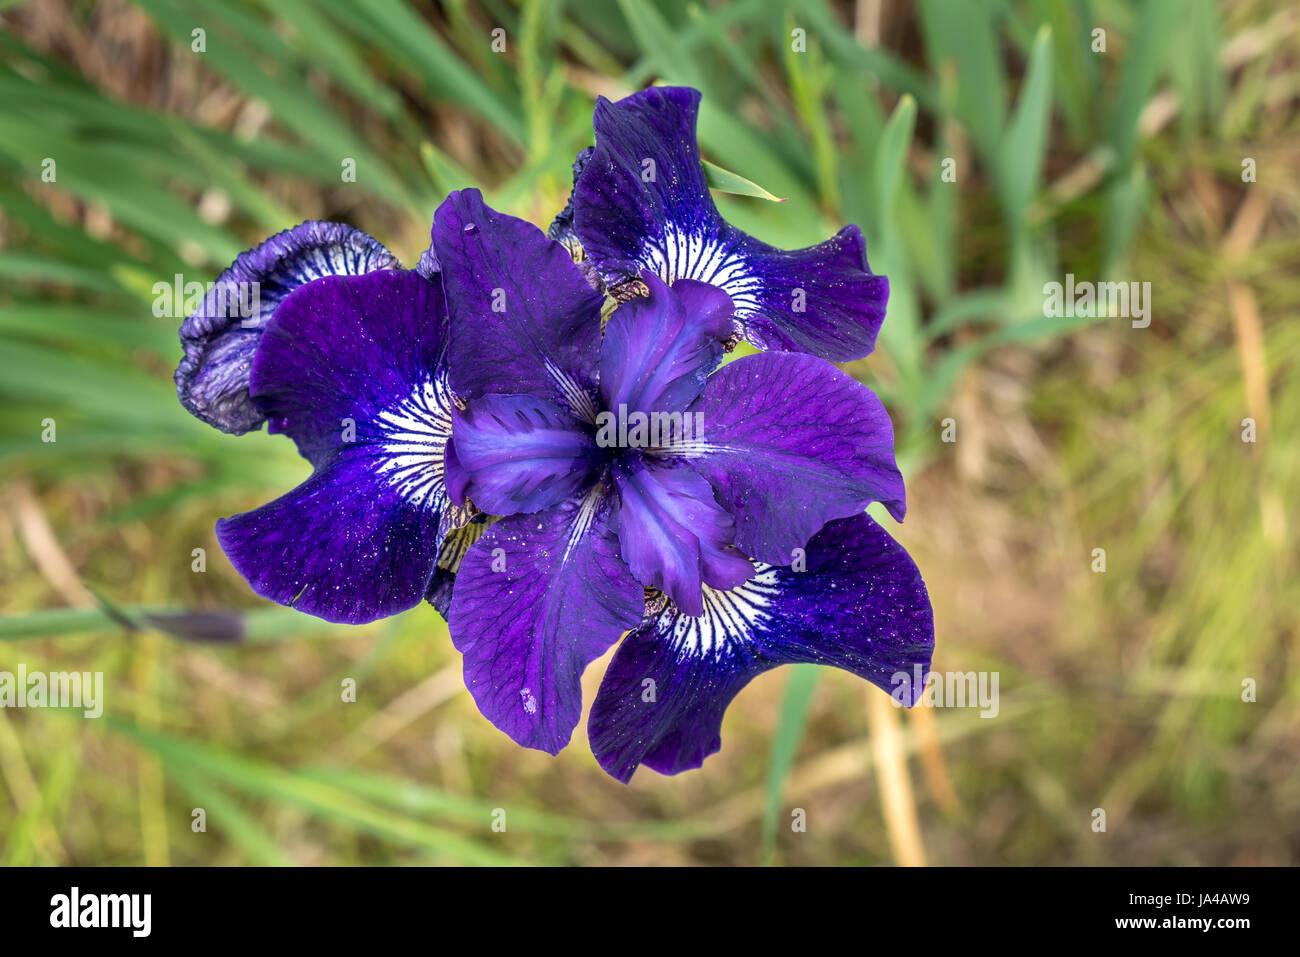 close-up-of-a-beardless-purple-iris-in-s